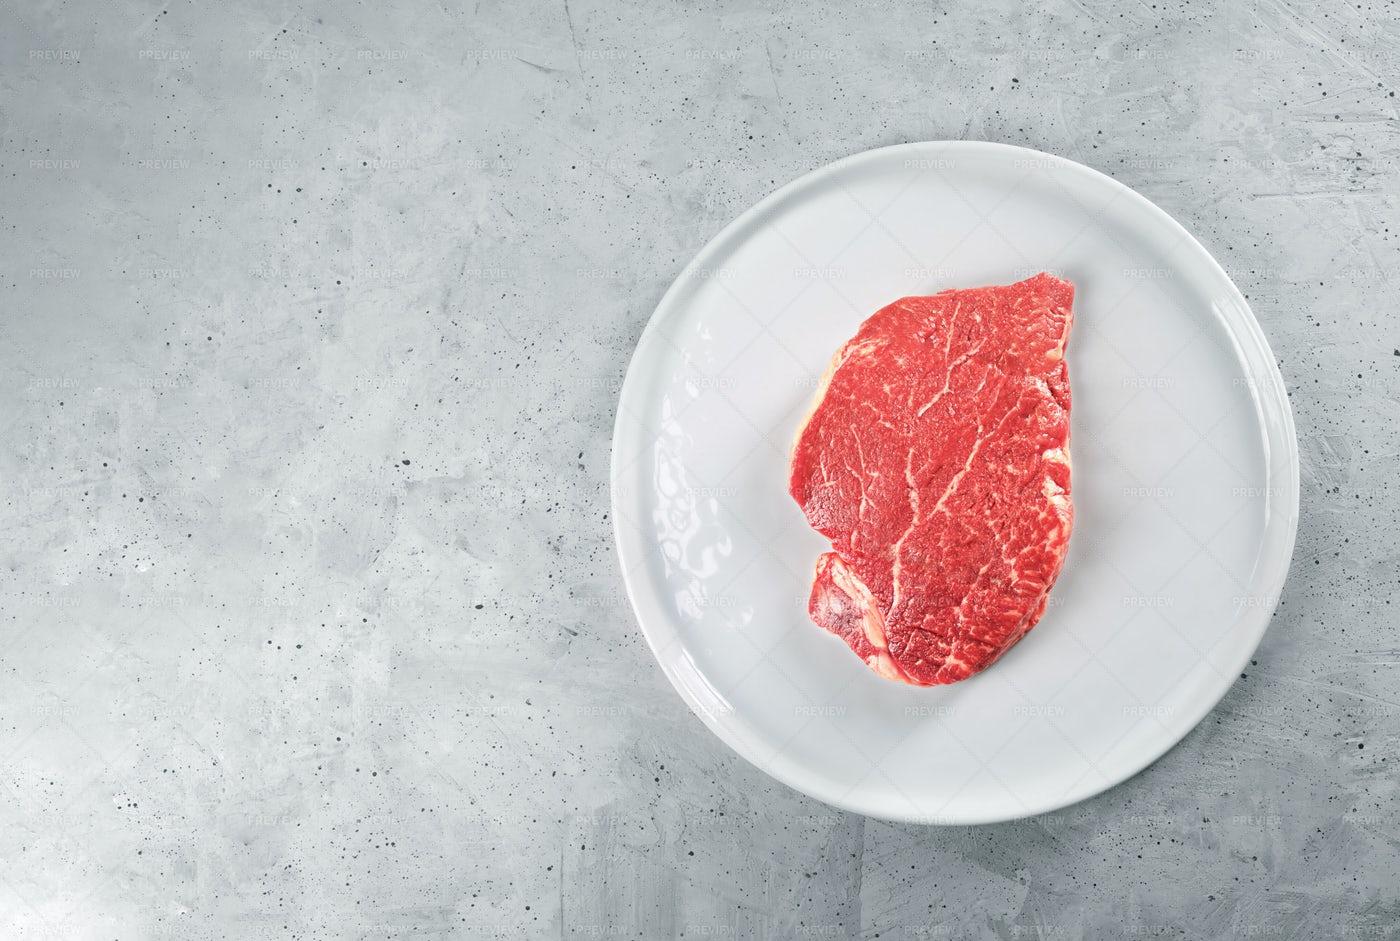 Raw Beef: Stock Photos